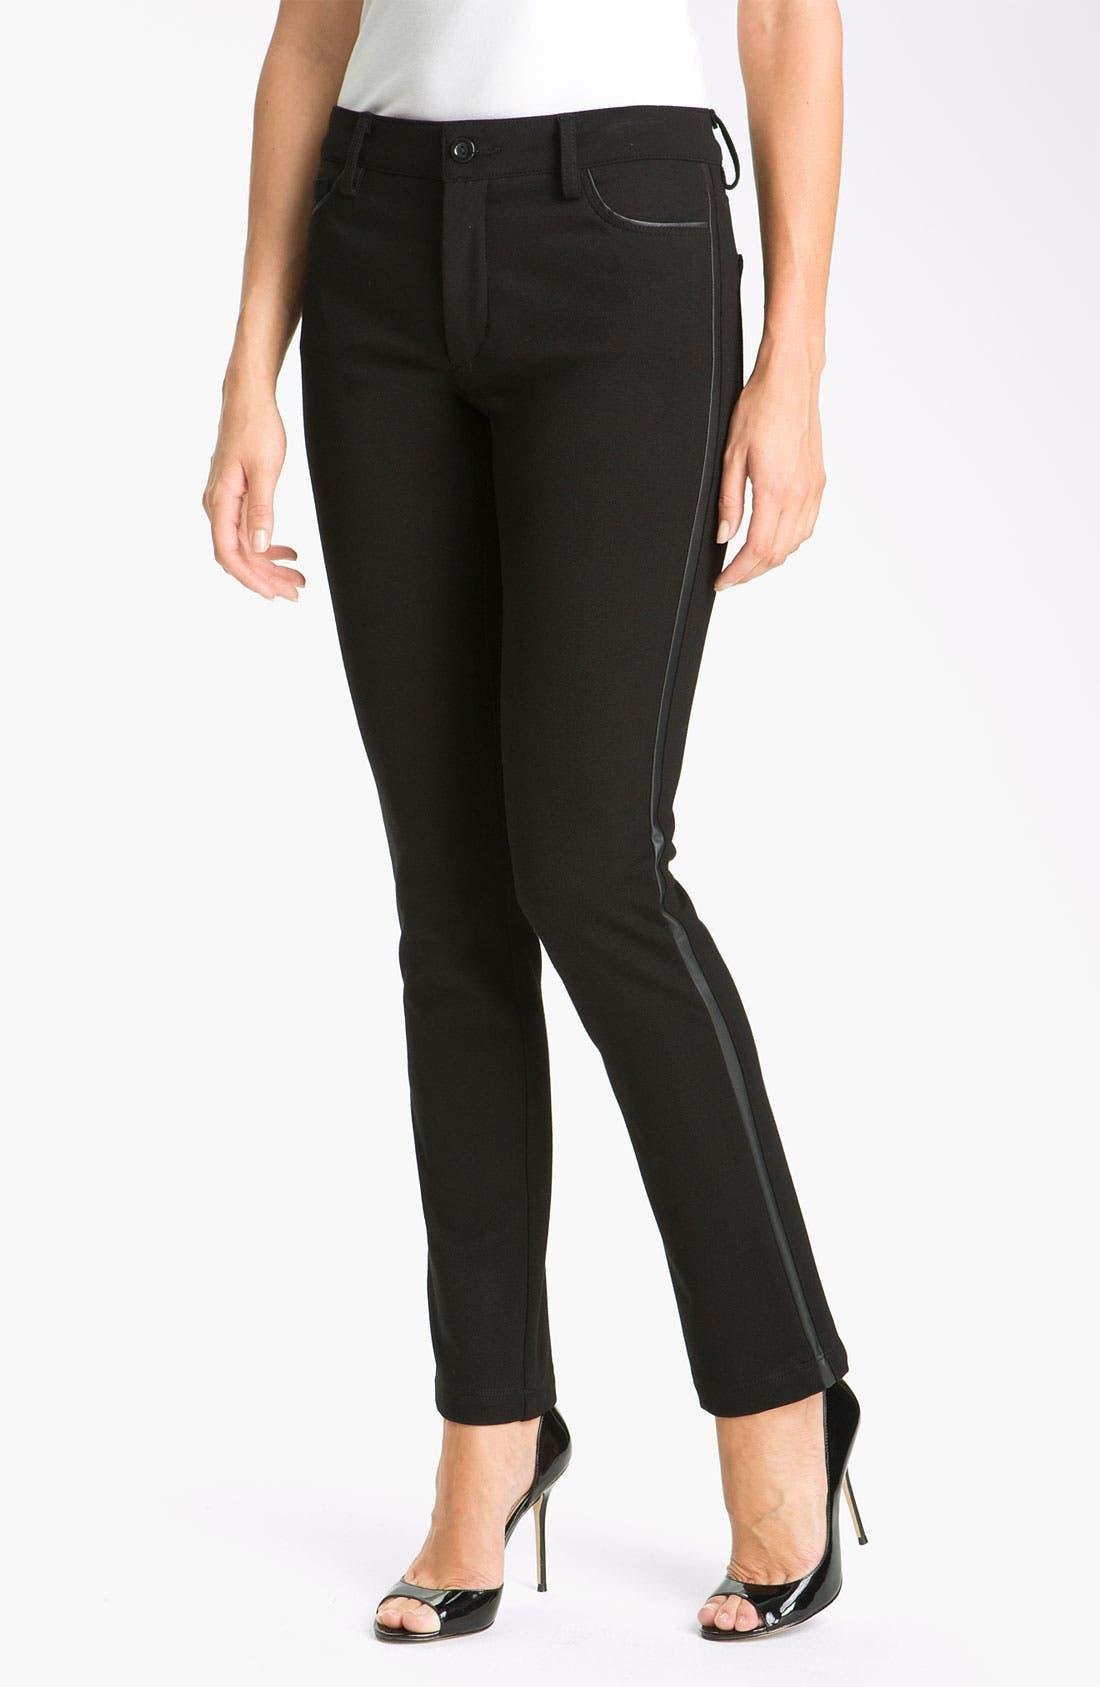 Main Image - NYDJ 'Pamela' Skinny Stretch Ponte Pants (Petite)